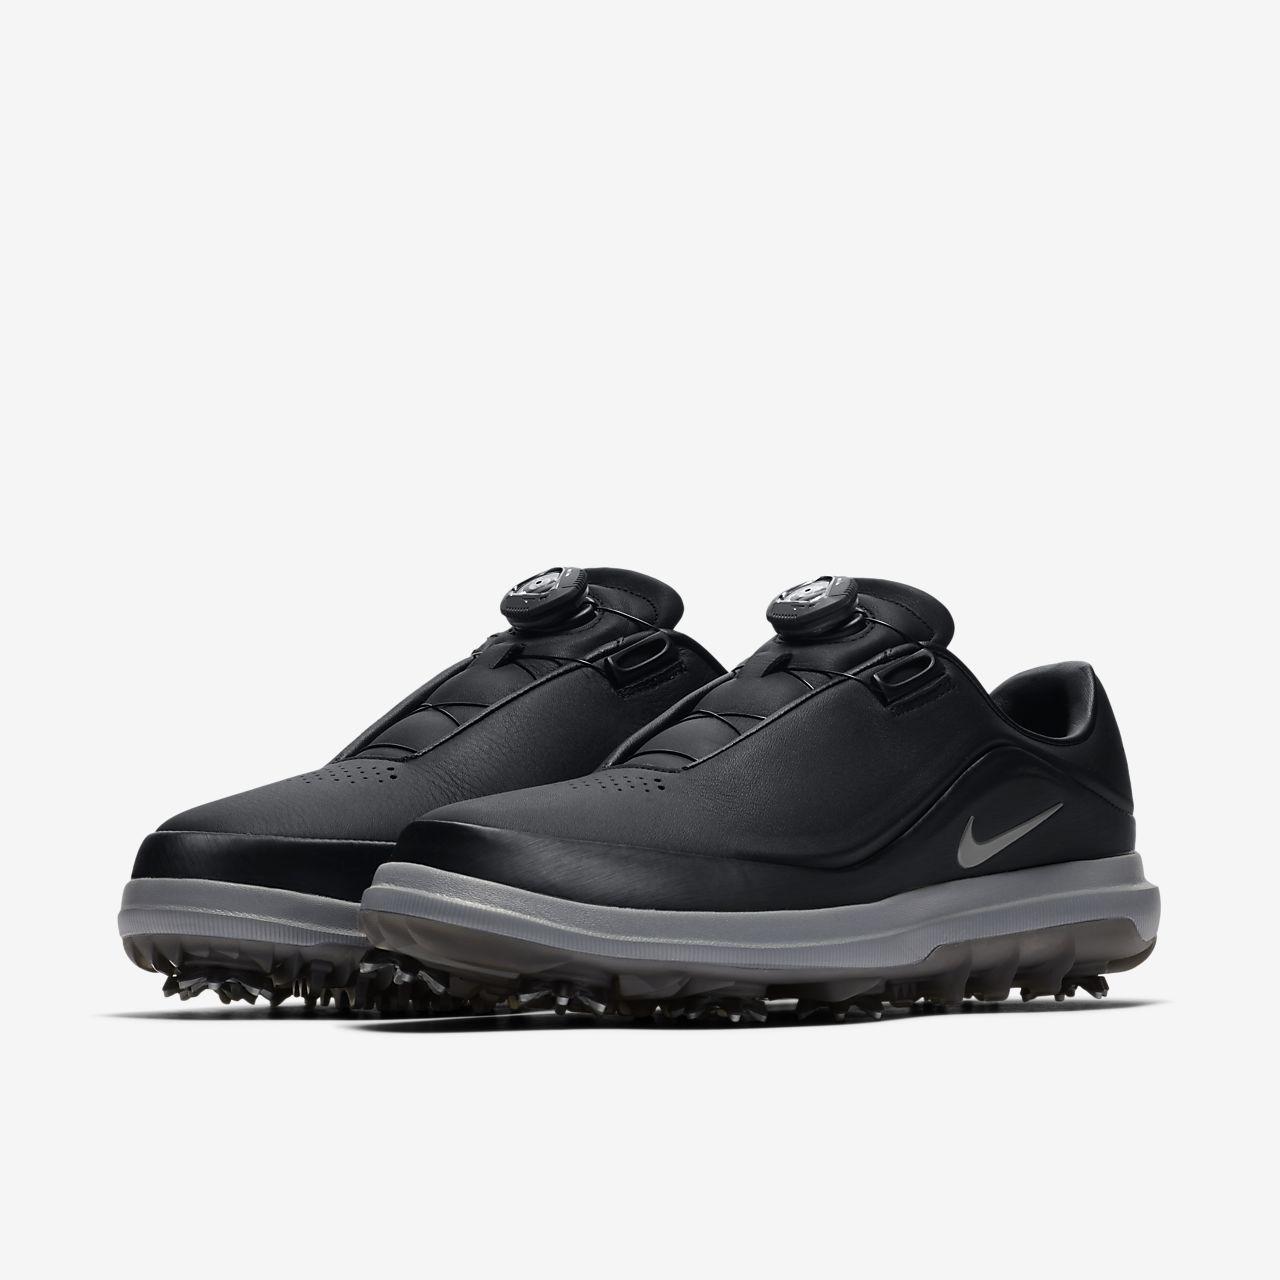 123d7bf84f9 Nike Air Zoom Precision BOA ® Men s Golf Shoe. Nike.com GB